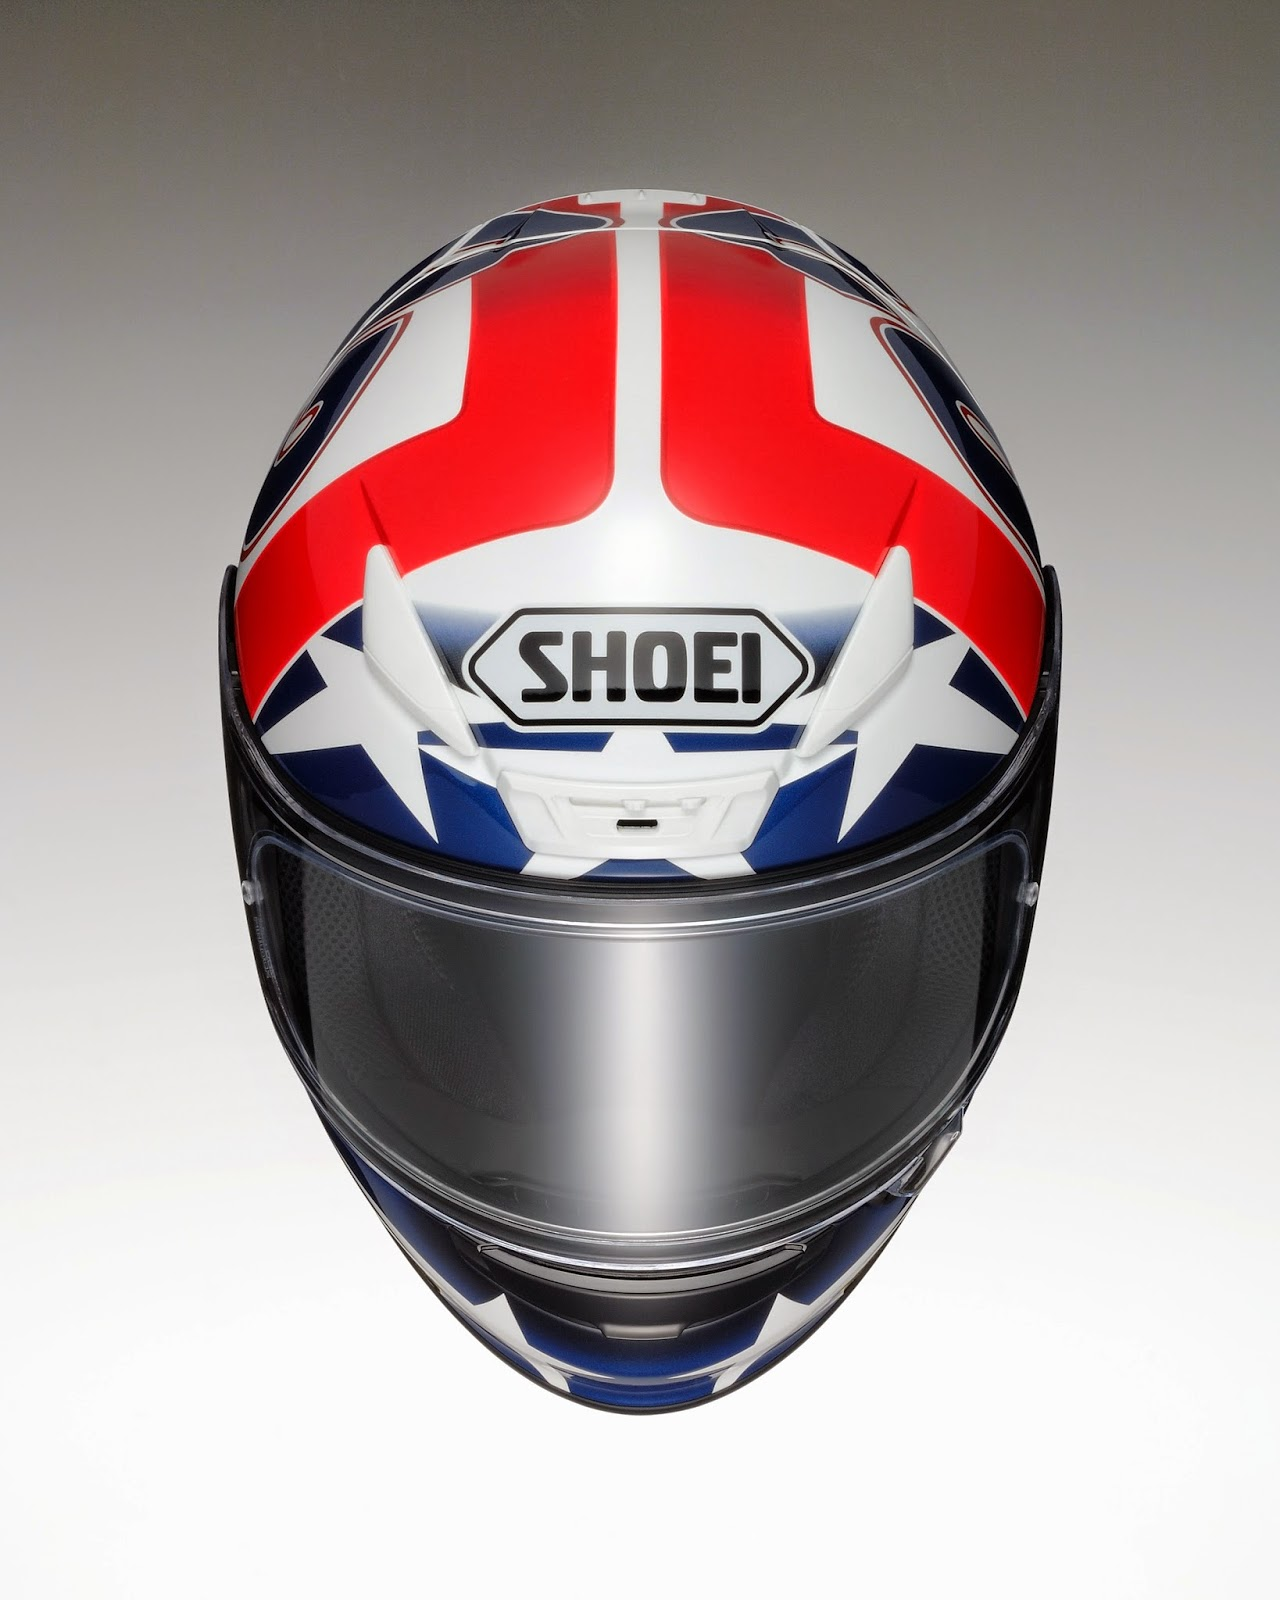 champion helmets new 2015 shoei marc marquez helmets. Black Bedroom Furniture Sets. Home Design Ideas